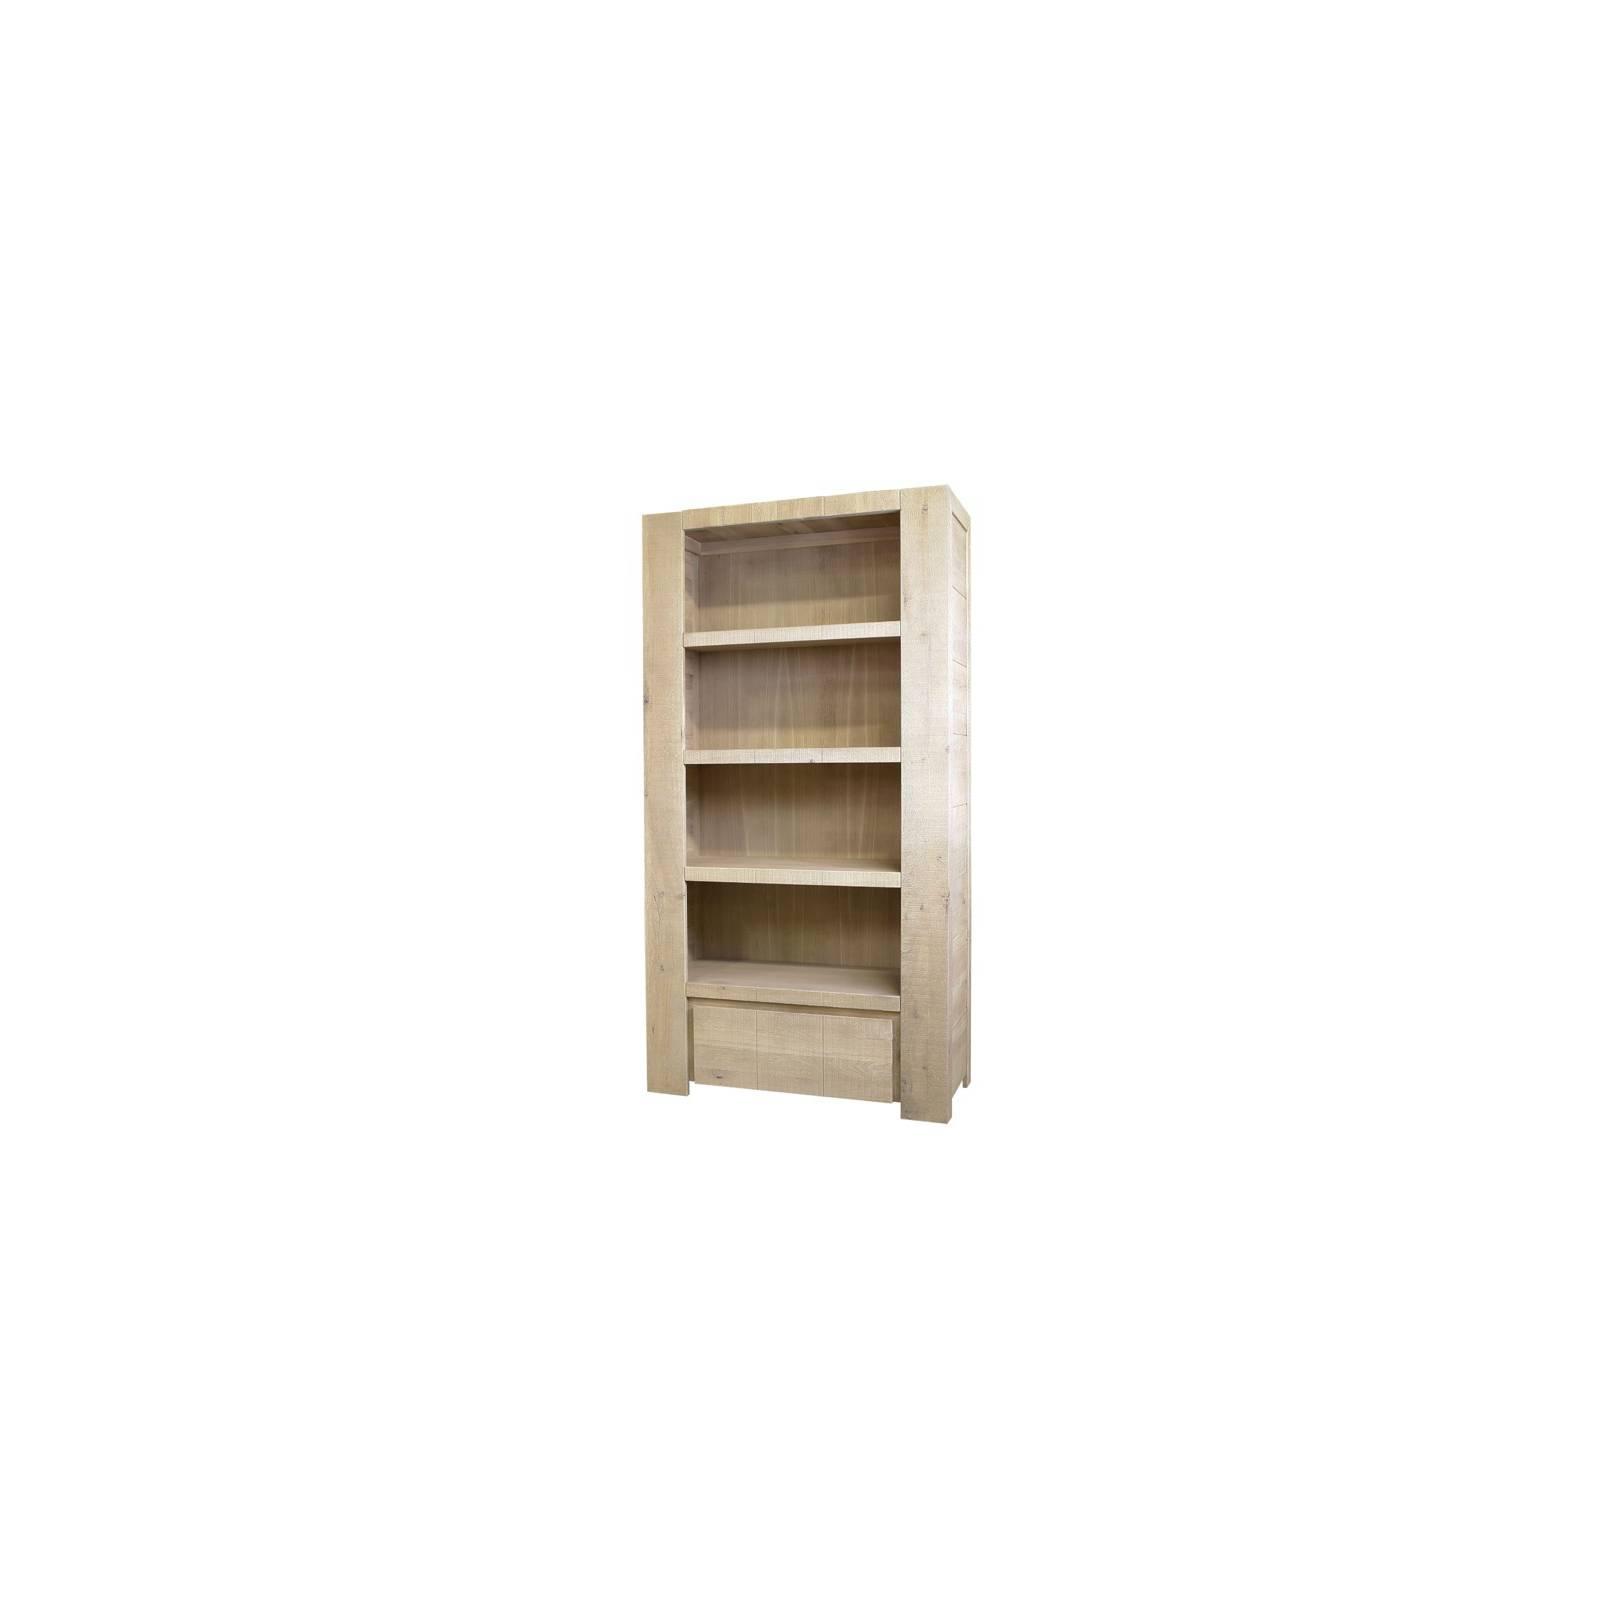 Bibliothèque Palma Chêne - meuble design